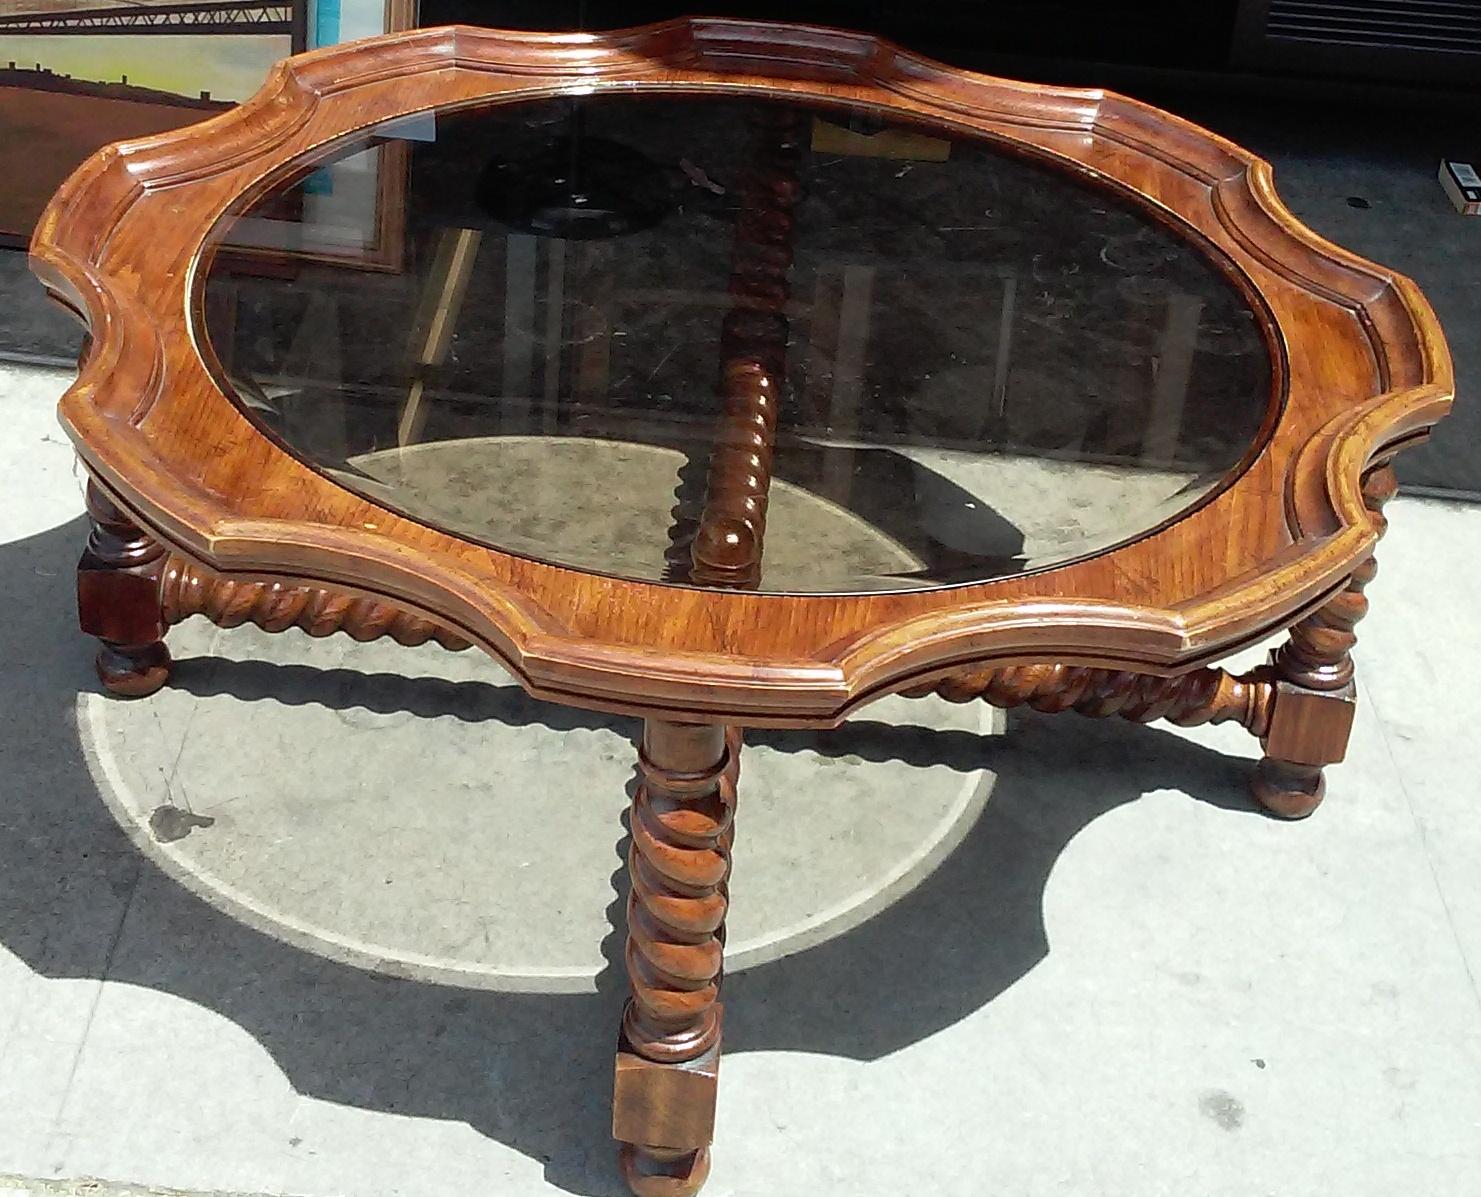 Uhuru Furniture Collectibles Sold Bargain Buy 989 40 Diameter Barley Twist Coffee Table